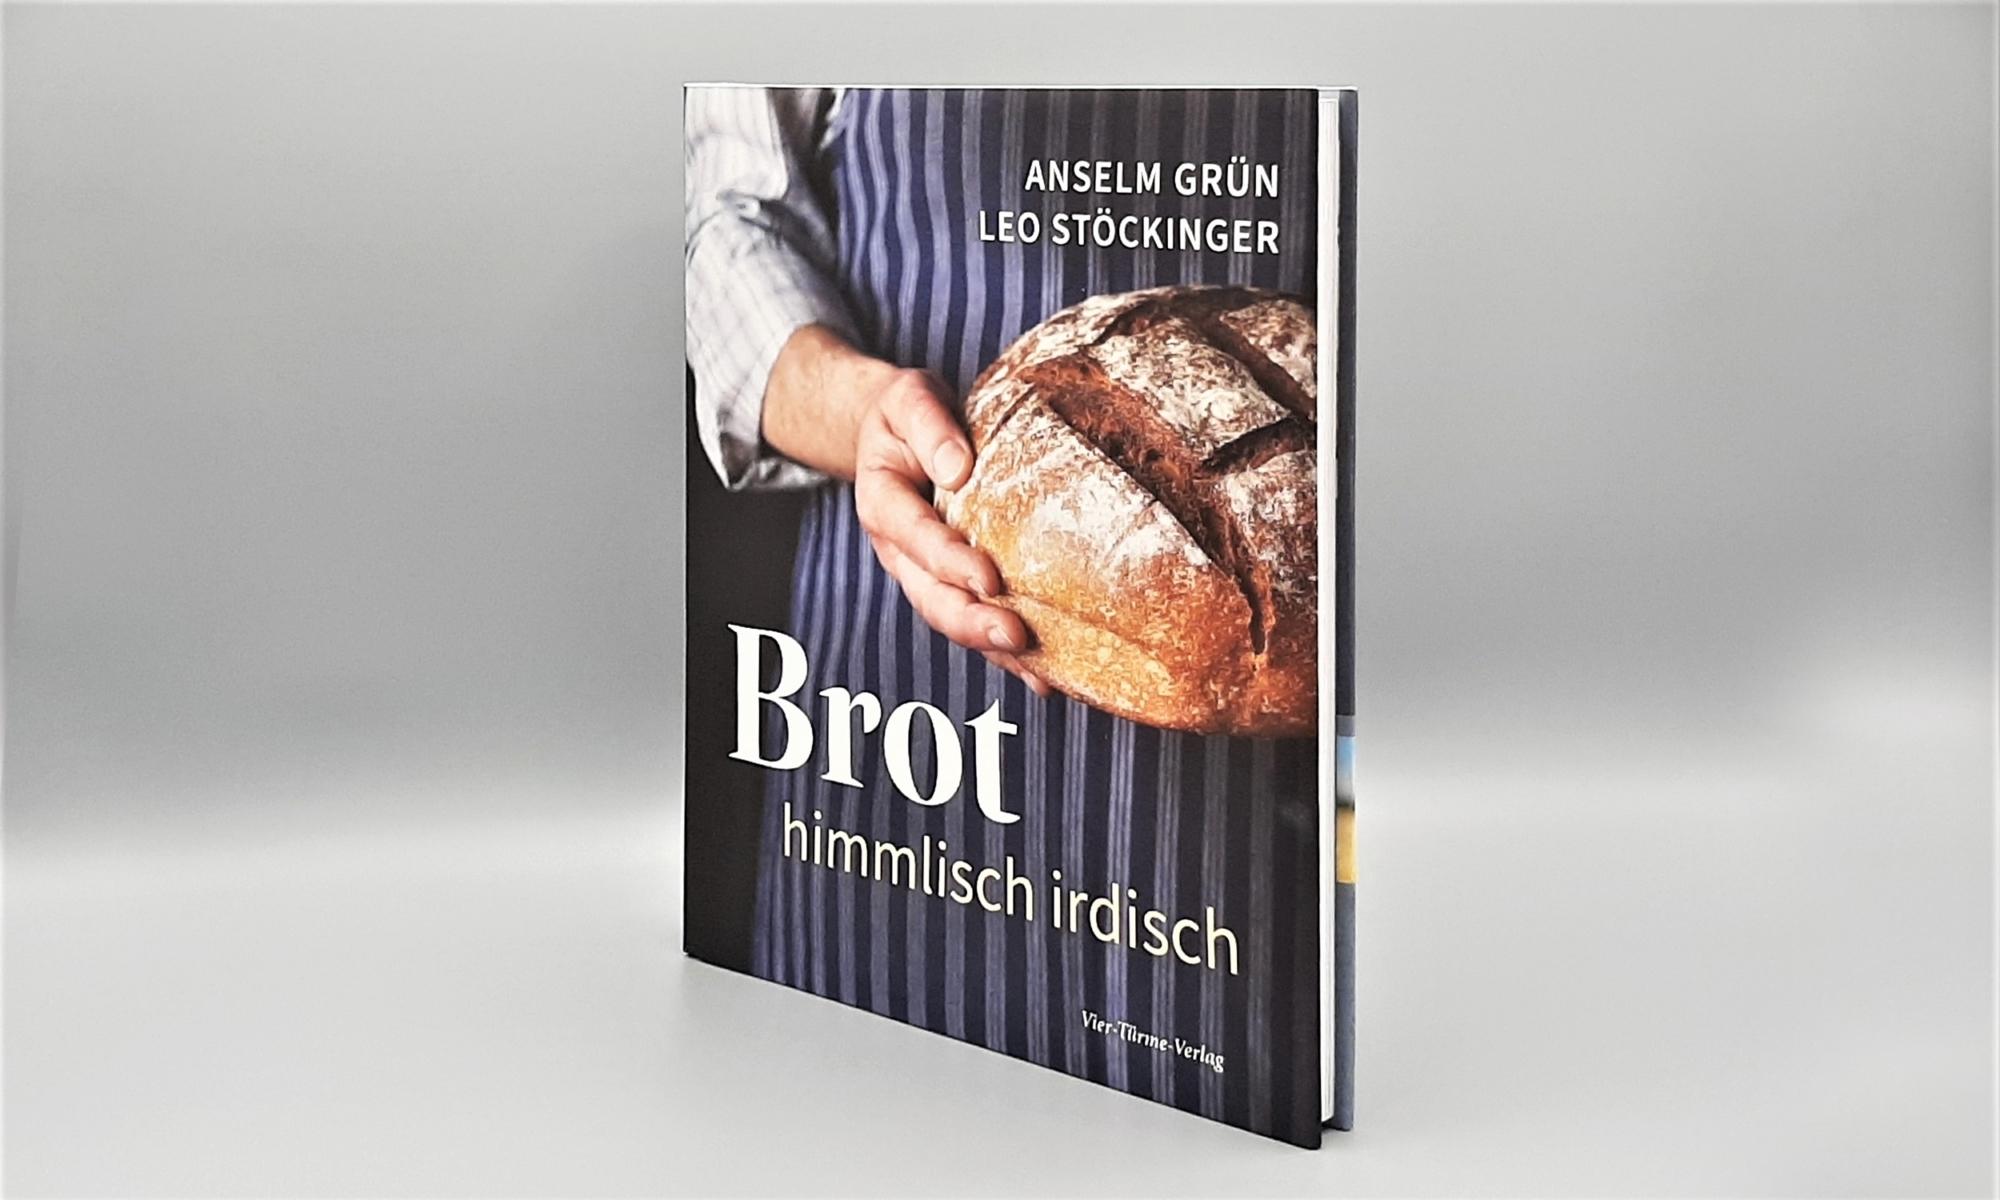 Brot himmlisch1 1